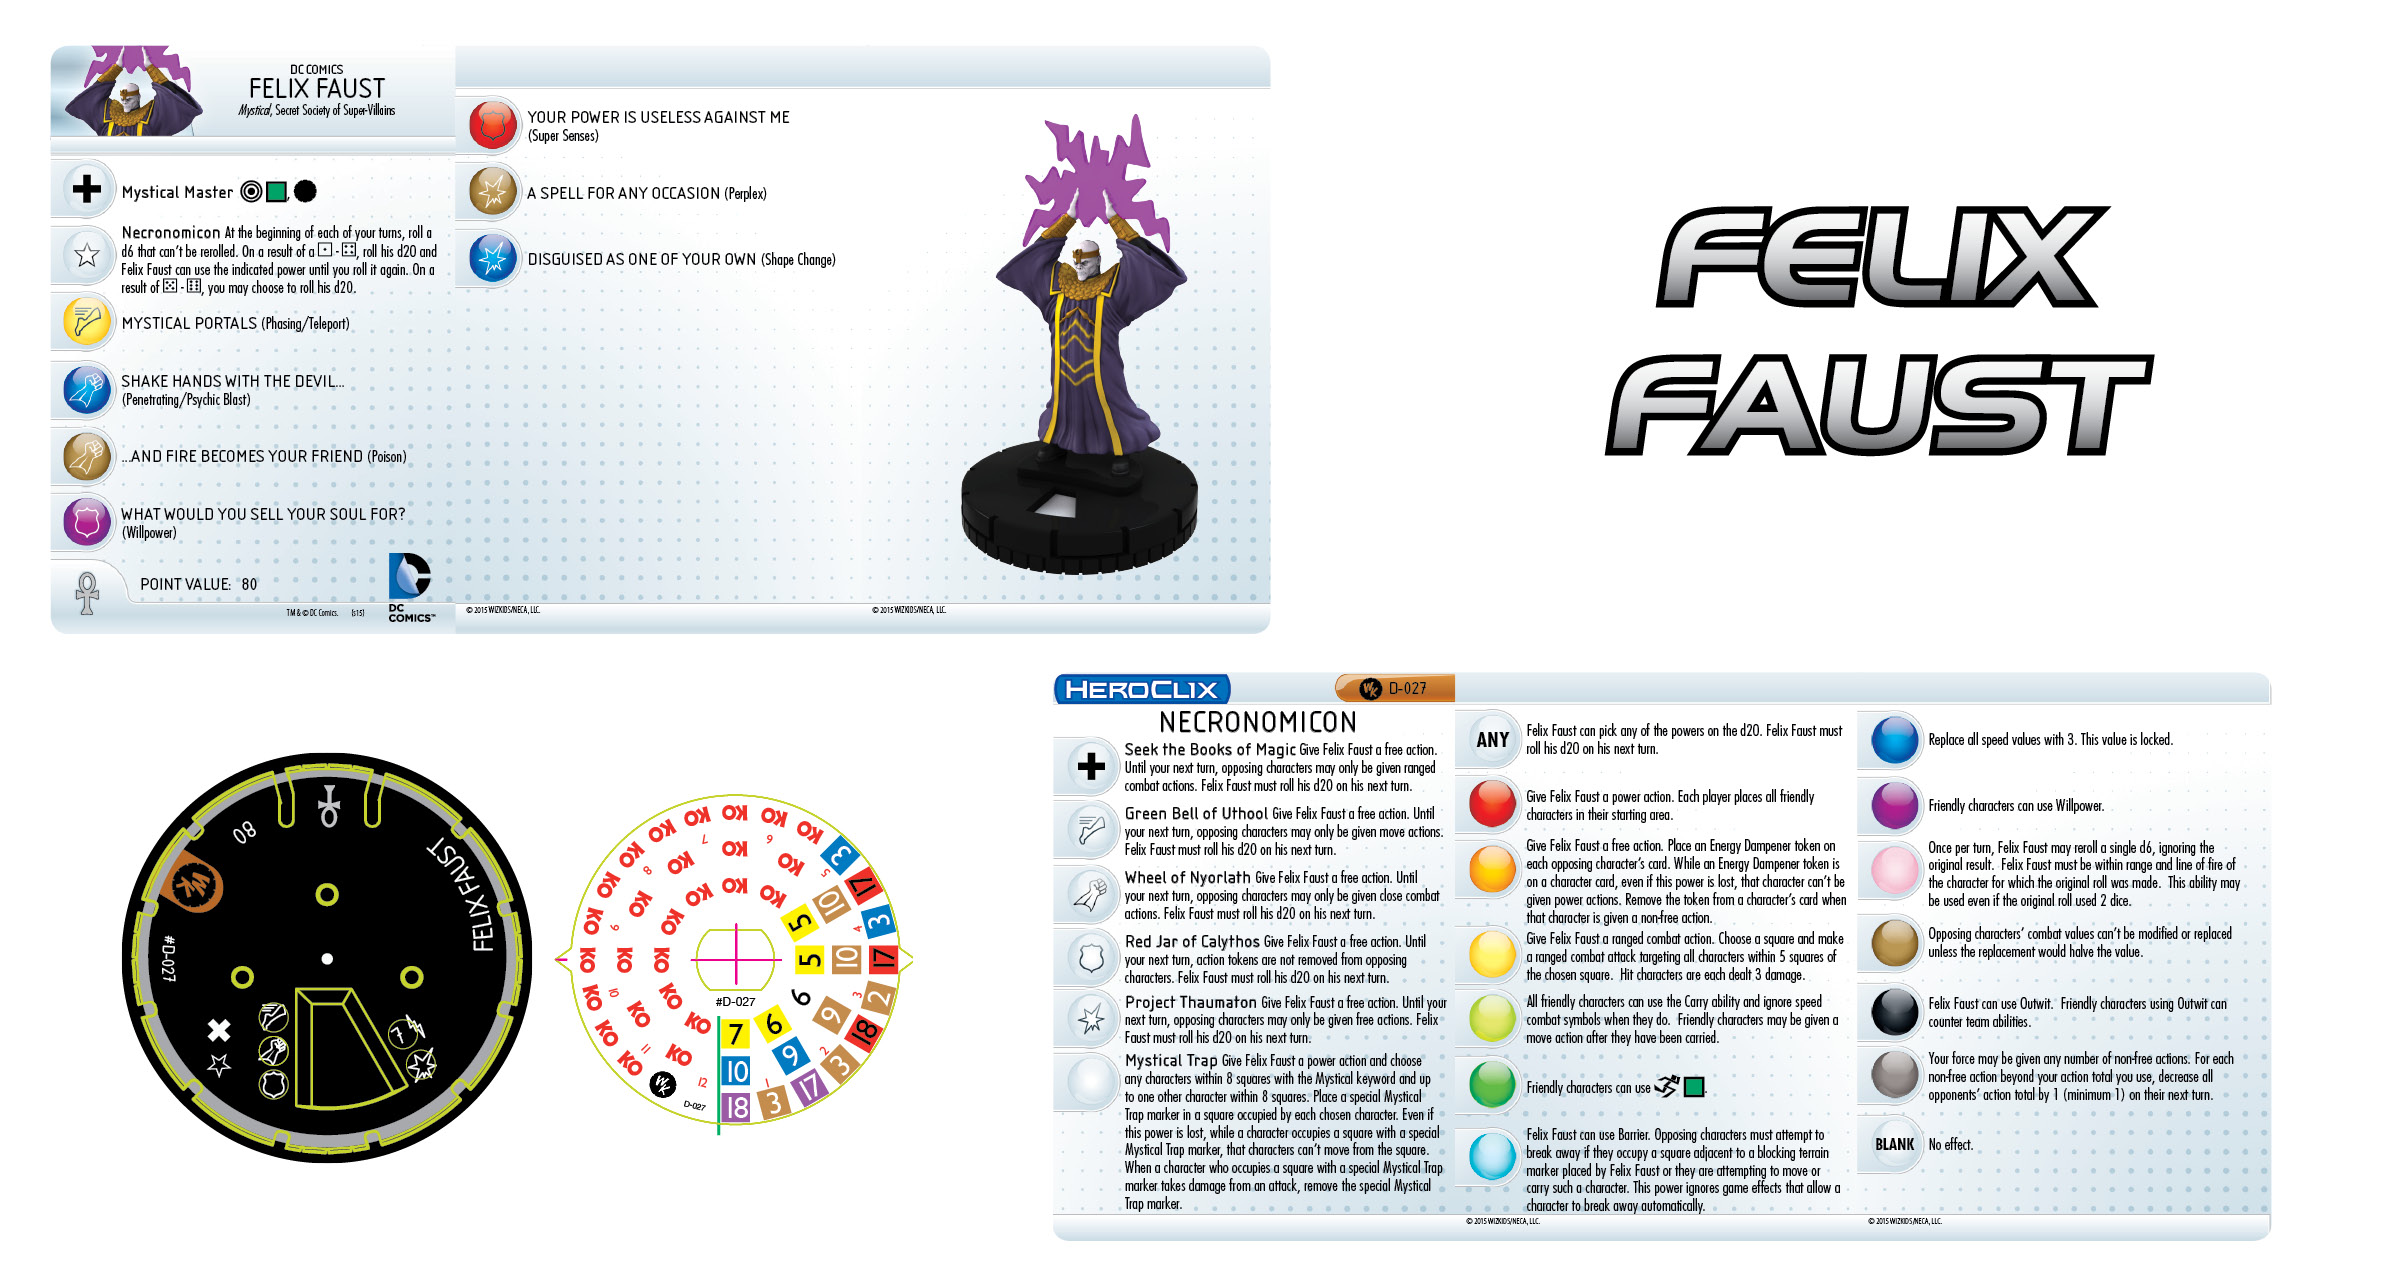 DC HeroClix: Felix Faust Convention Exclusive